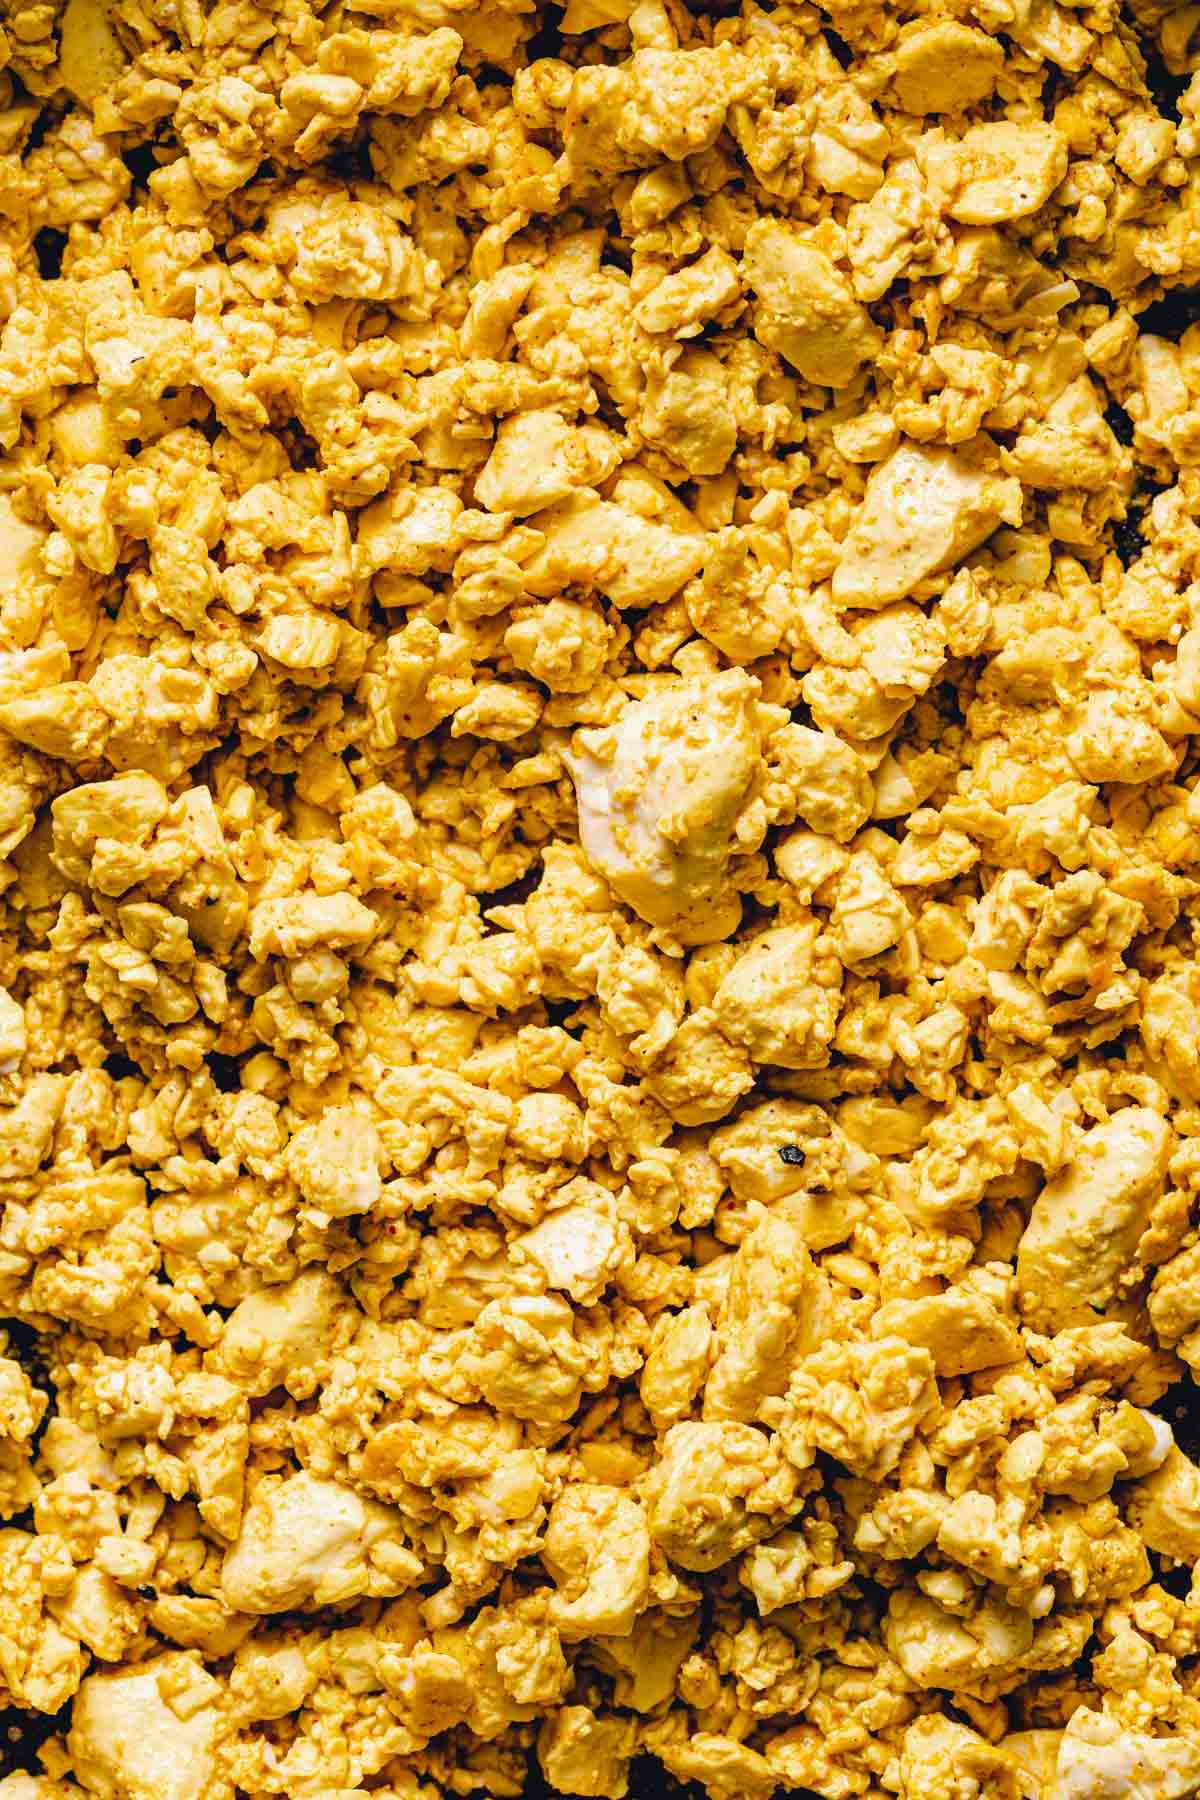 A close-up image of silken scrambled tofu.